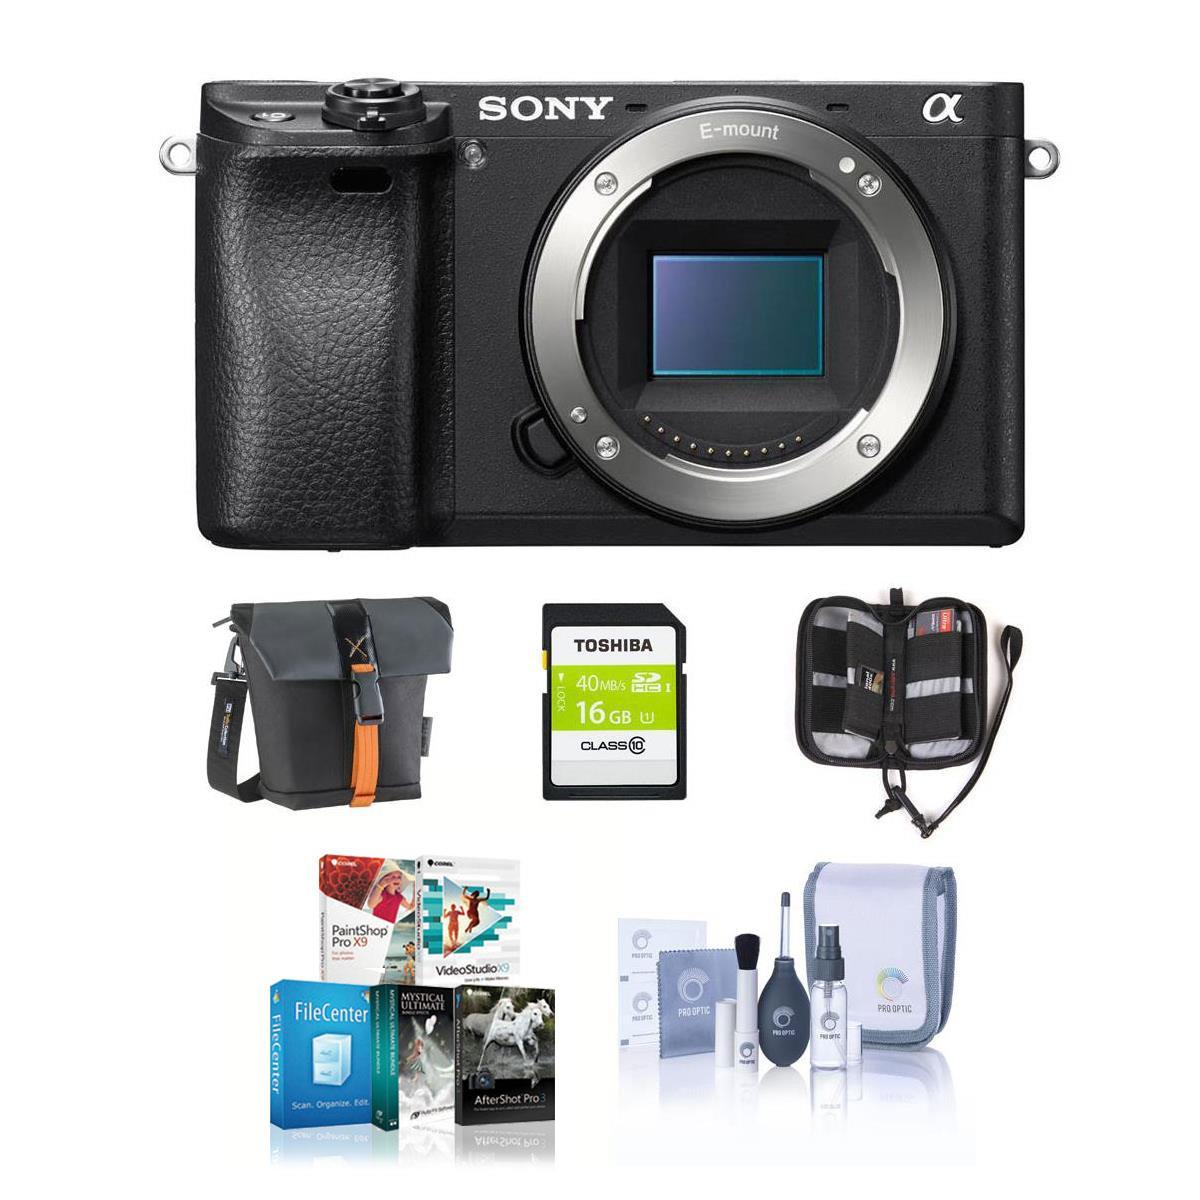 Sony a6300 Mirrorless Digital Camera (body) $898 or Sony a6300 Mirrorless Digital Camera + 16-50mm Lens + rewards $1048 + free shipping